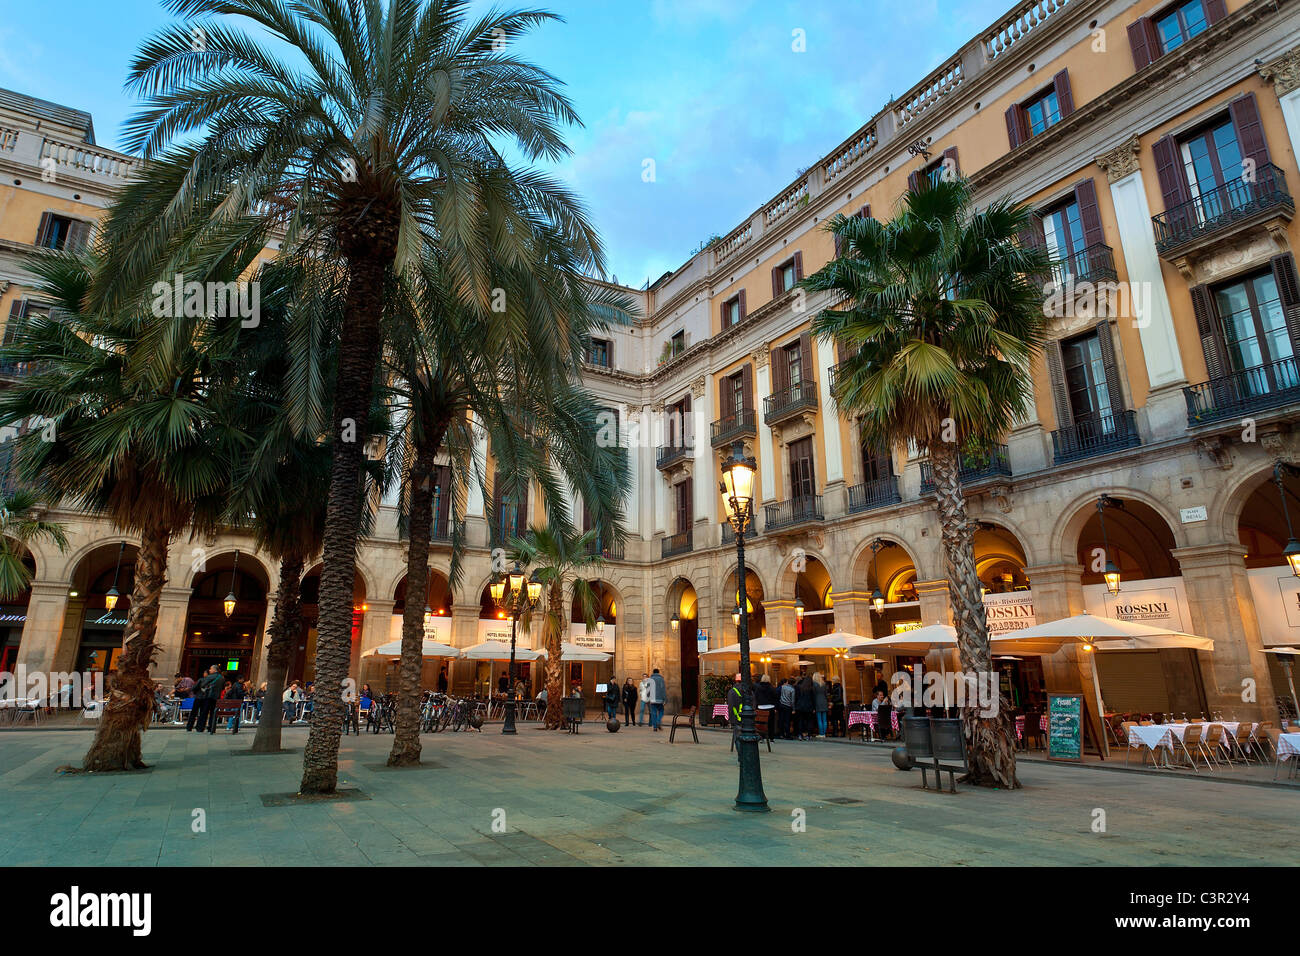 Spain, Catalonia, Barcelona, Barri Gotic district, Placa reial - Stock Image